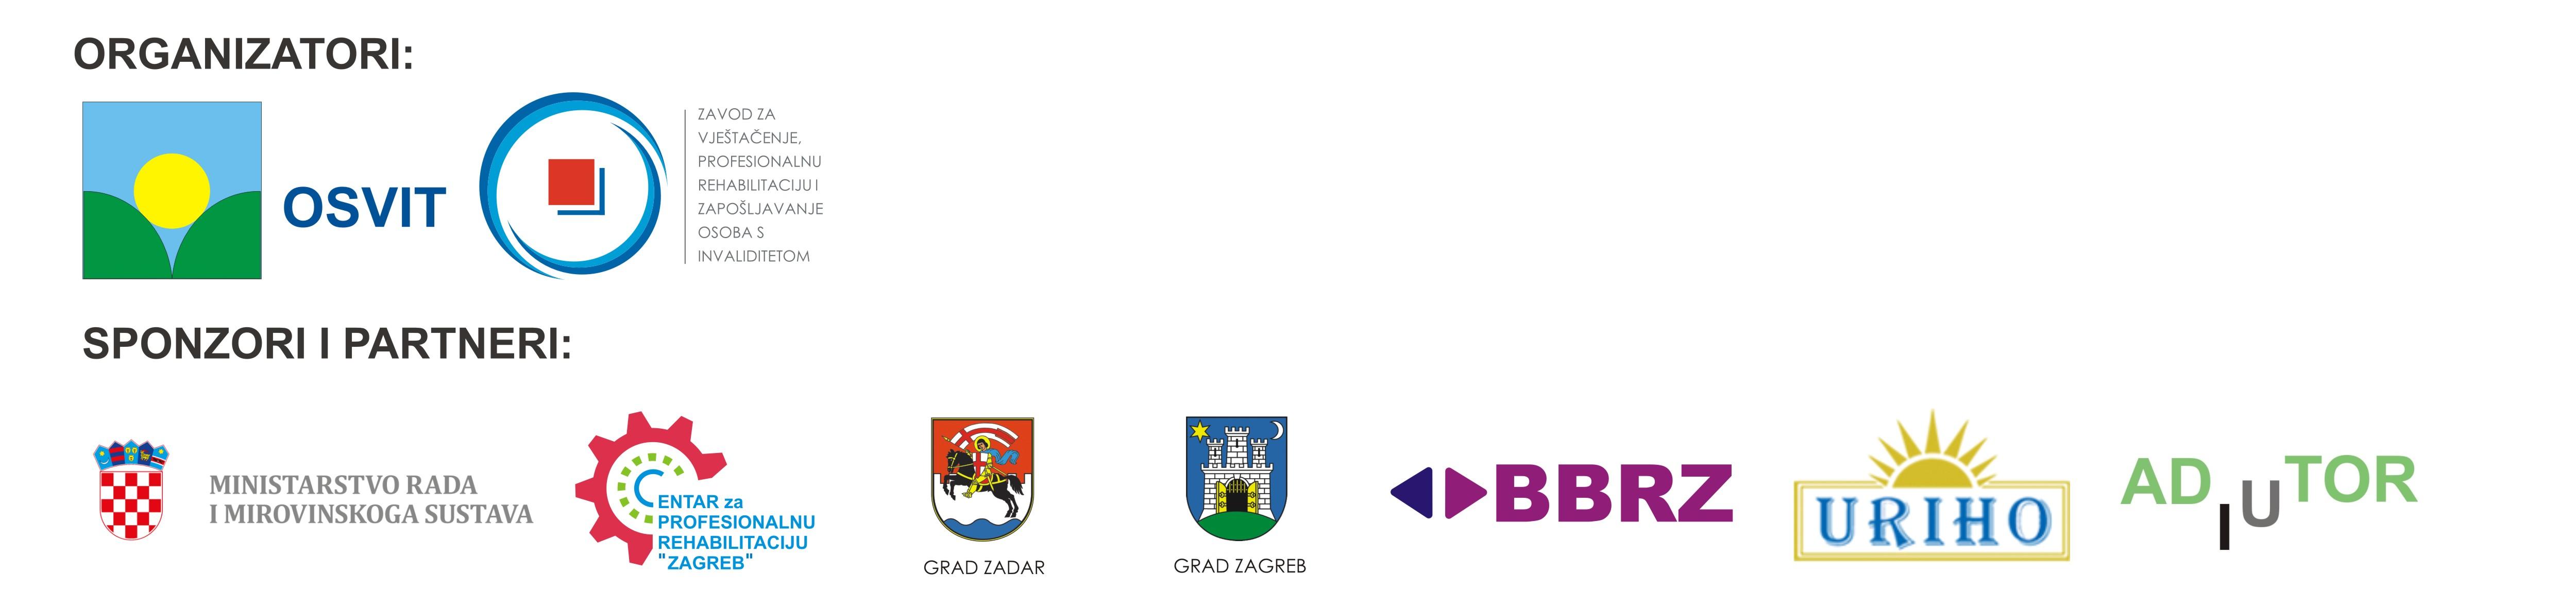 Sponsors i partners